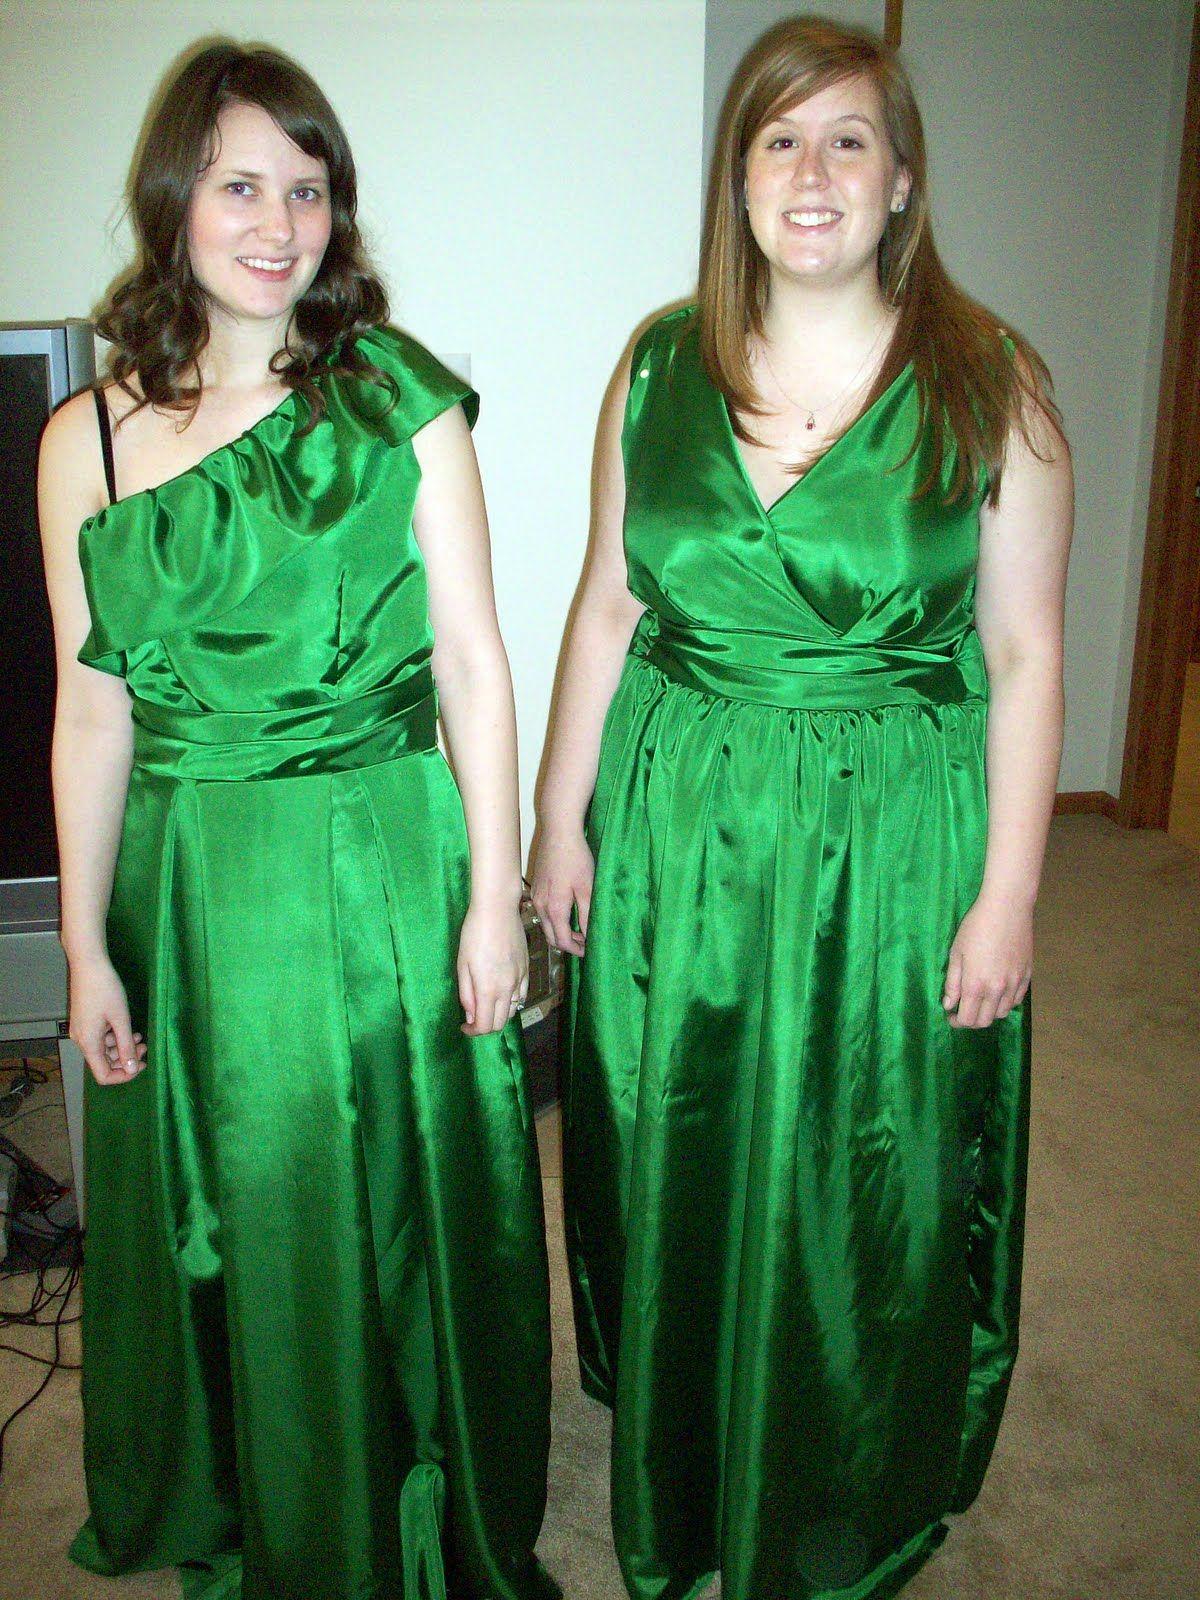 worst bridesmaid dresses - Google Search | Wedding stuff ...